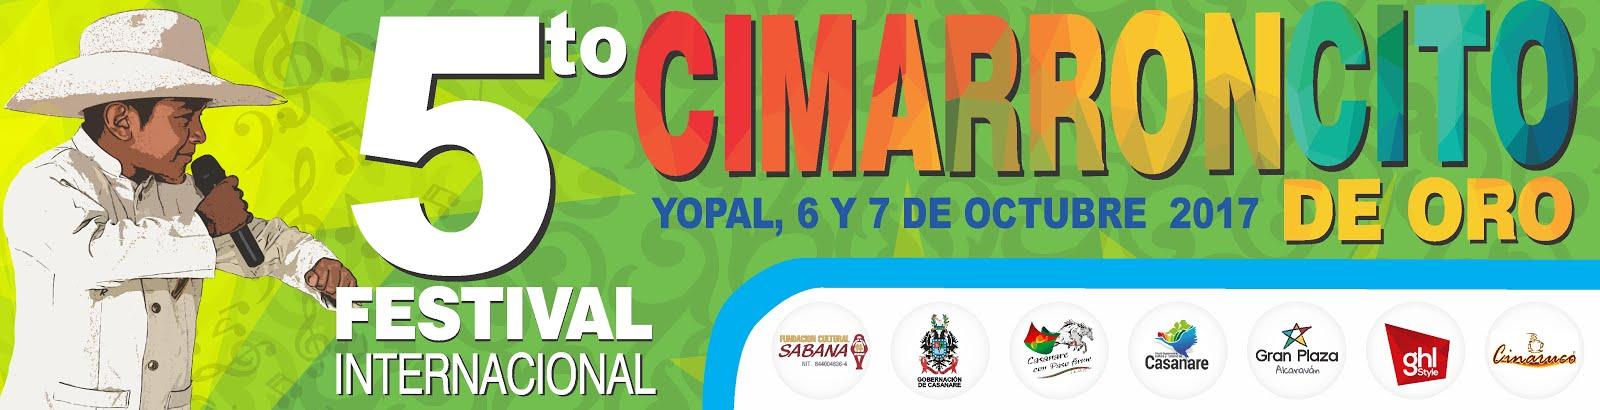 CIMARRONCITO DE ORO. 5to Festival Internacional